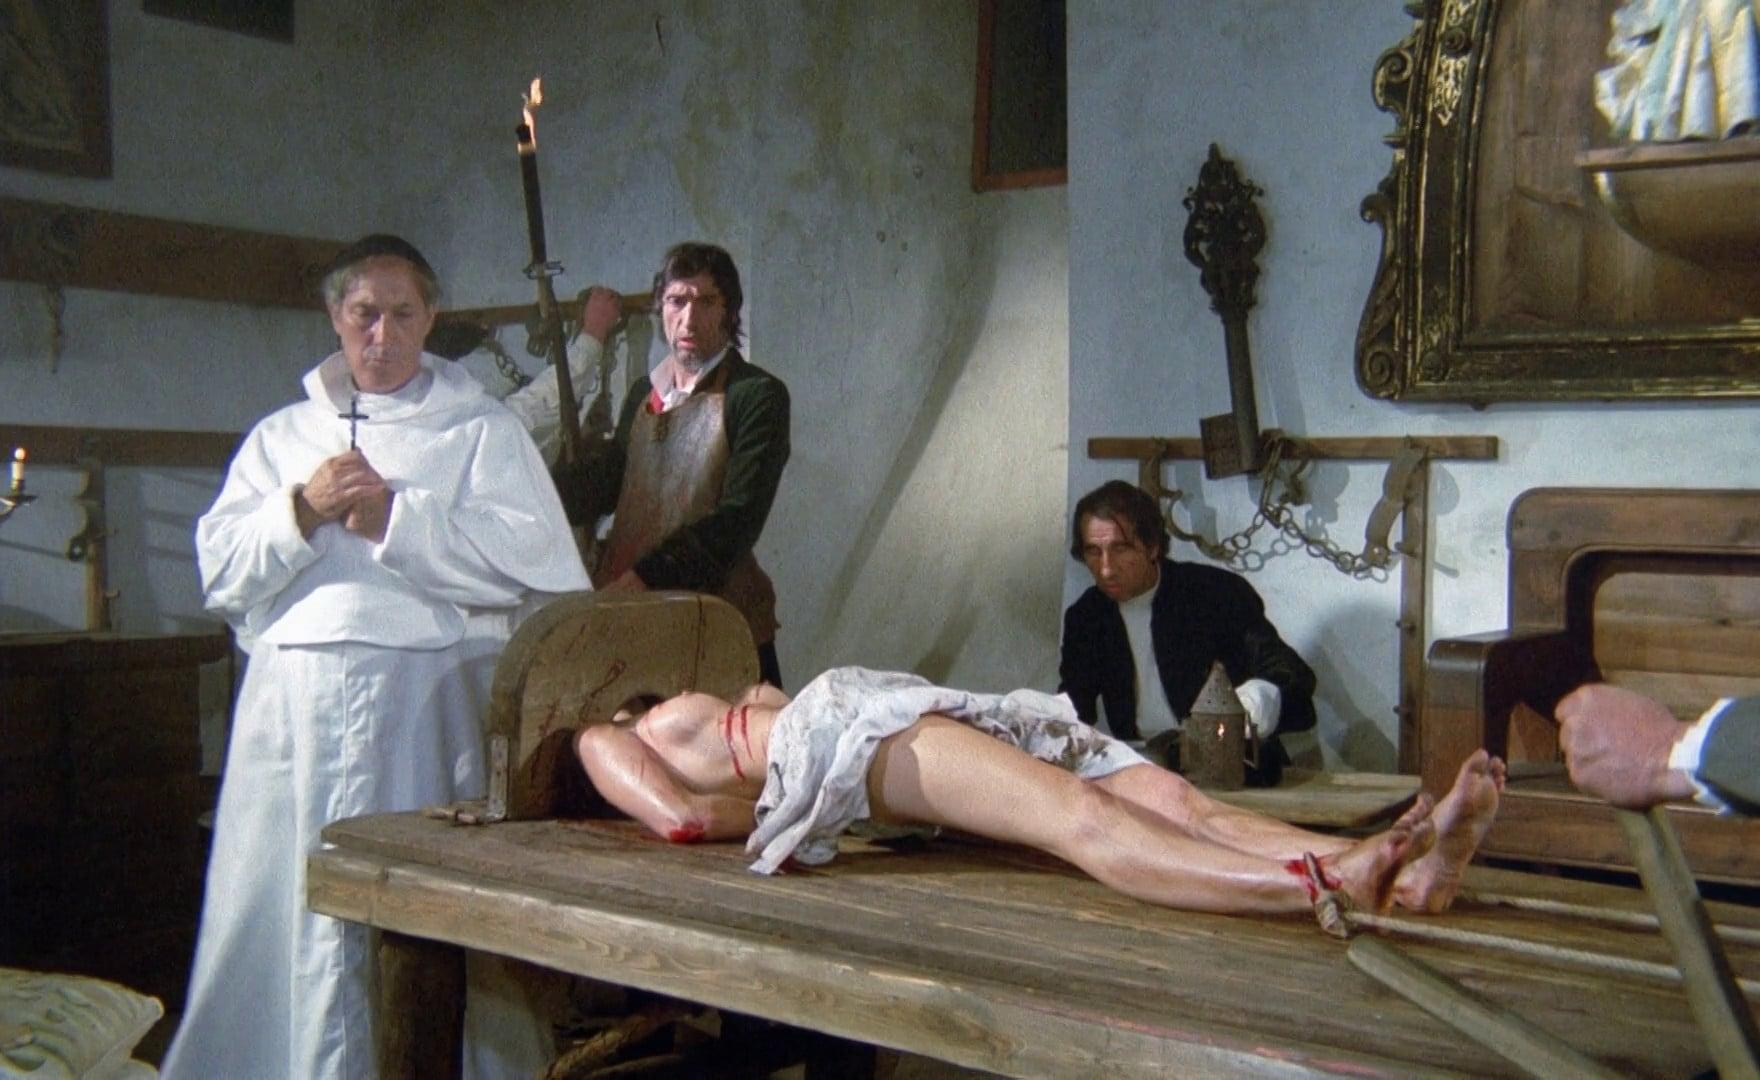 Club satan the witches sabbath scene 2 10